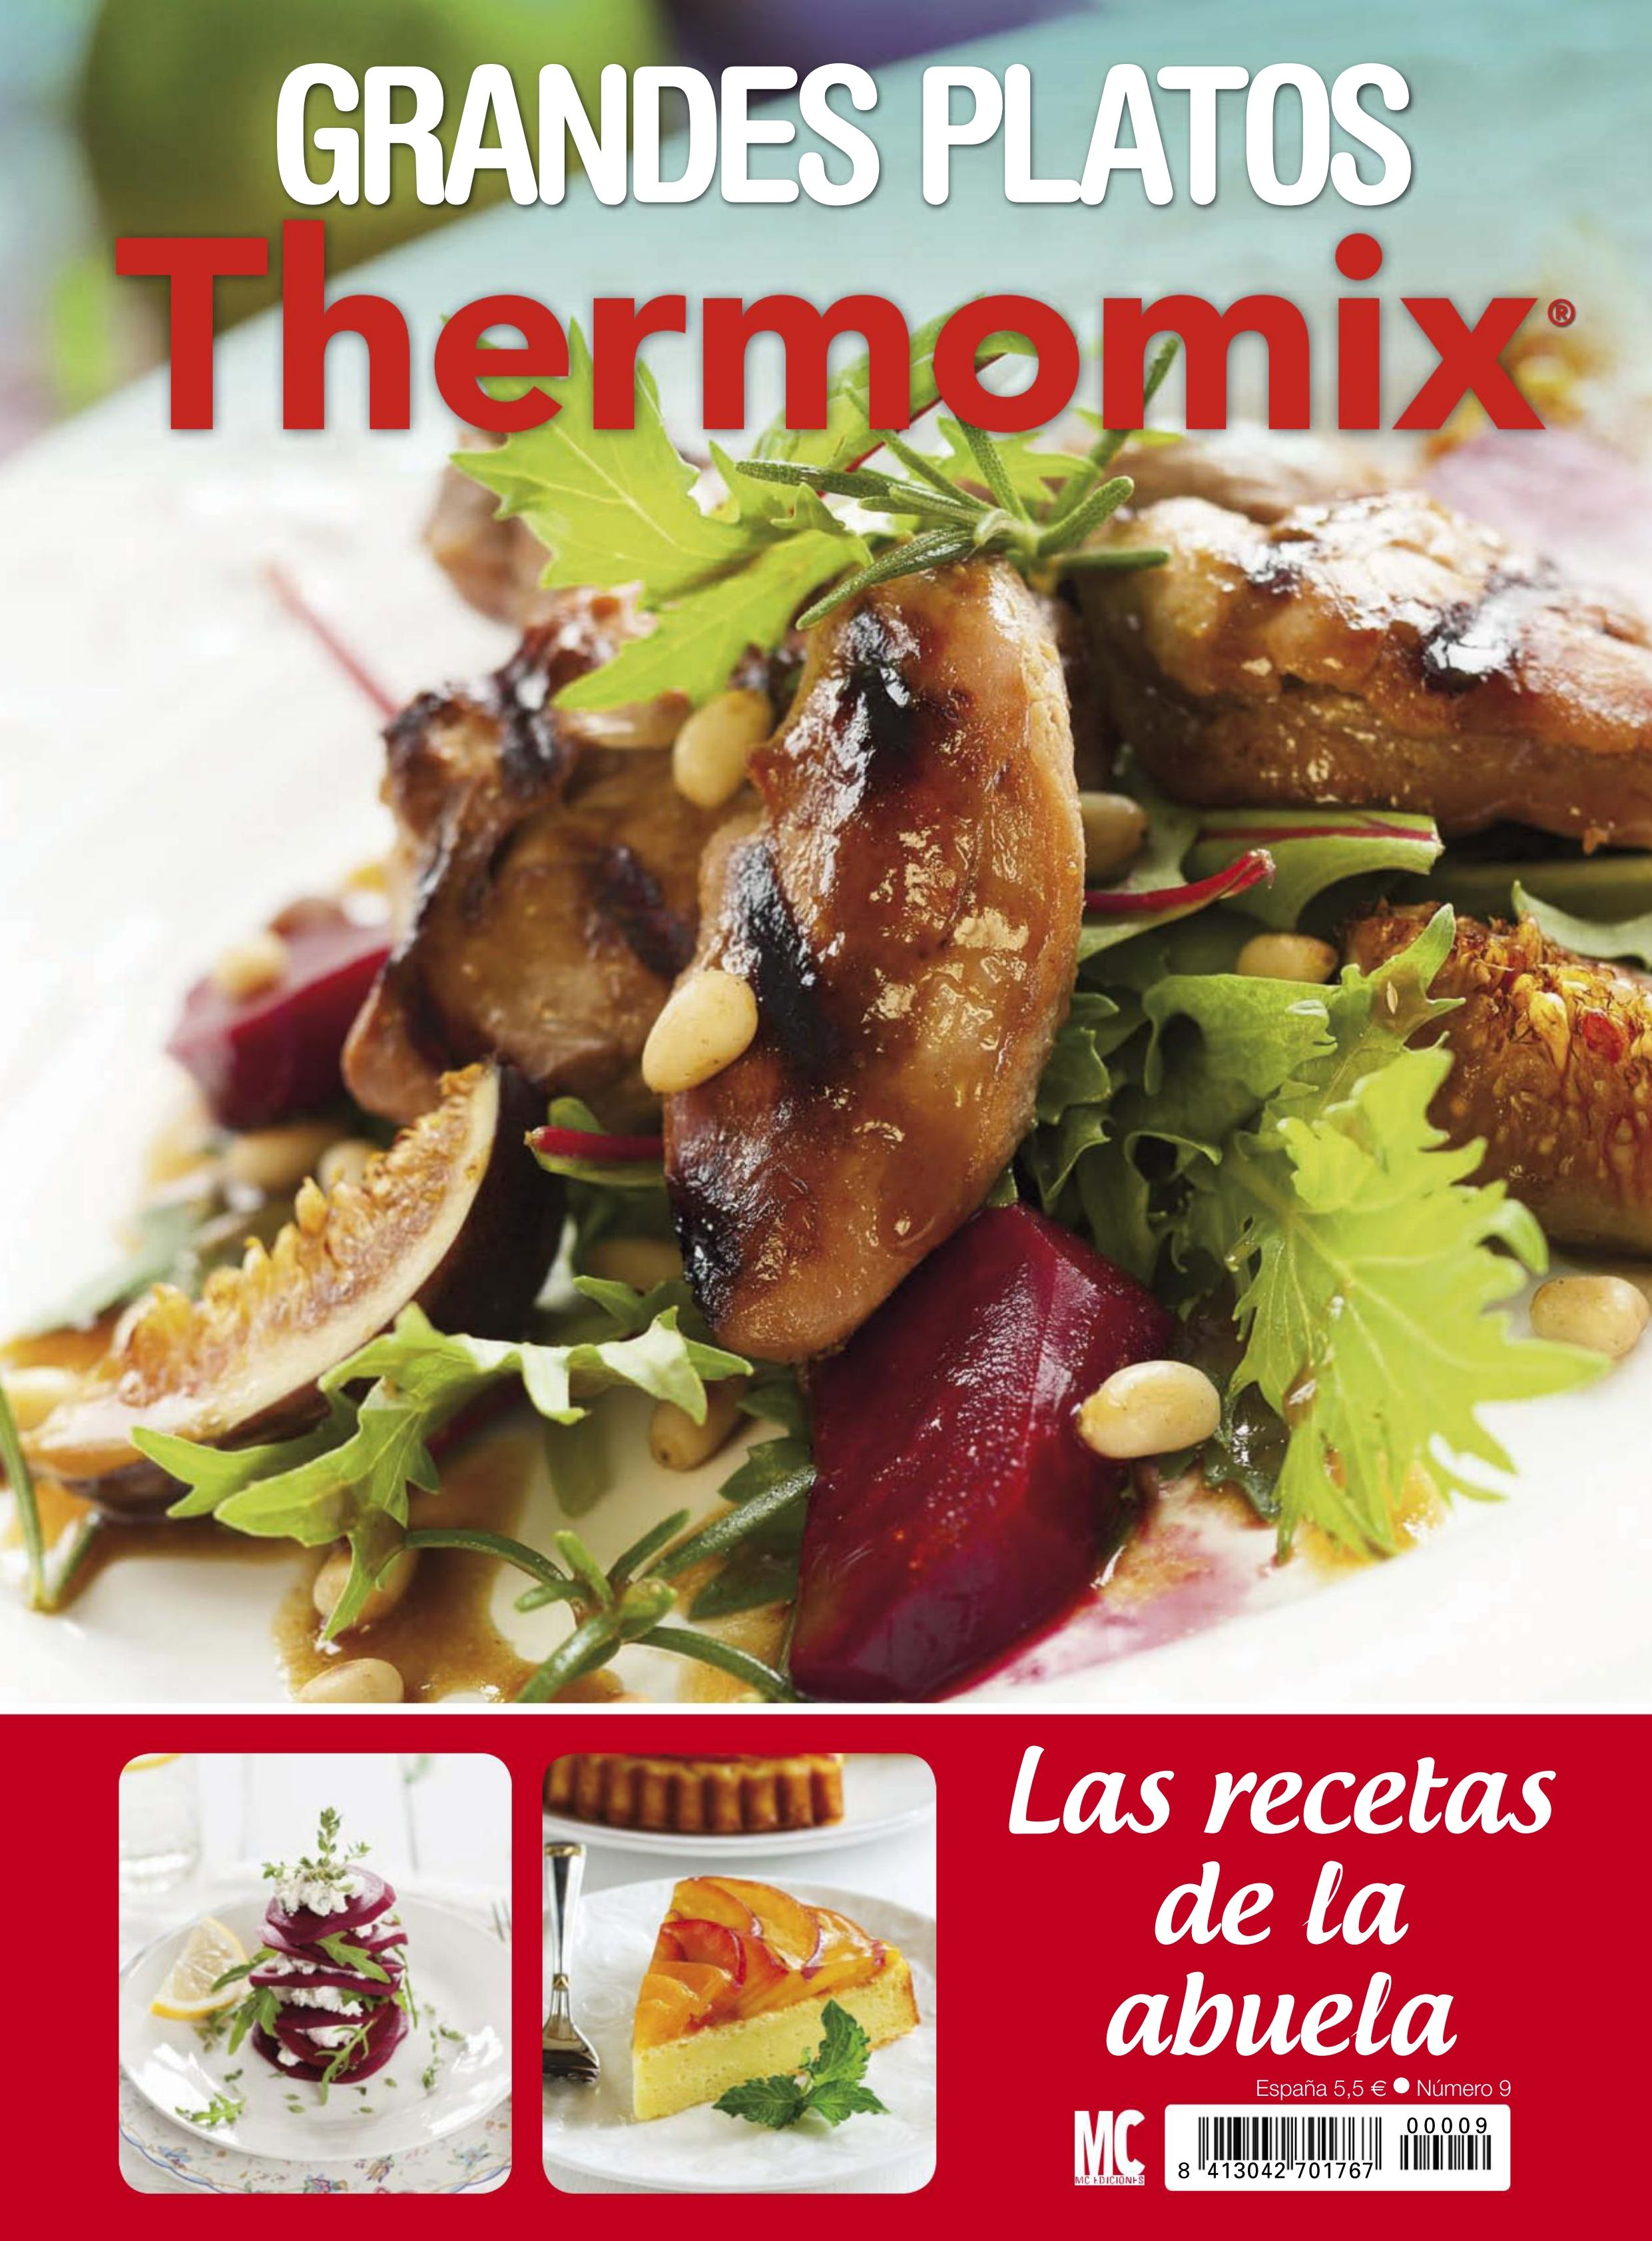 Recetas de dieta thermomix 5